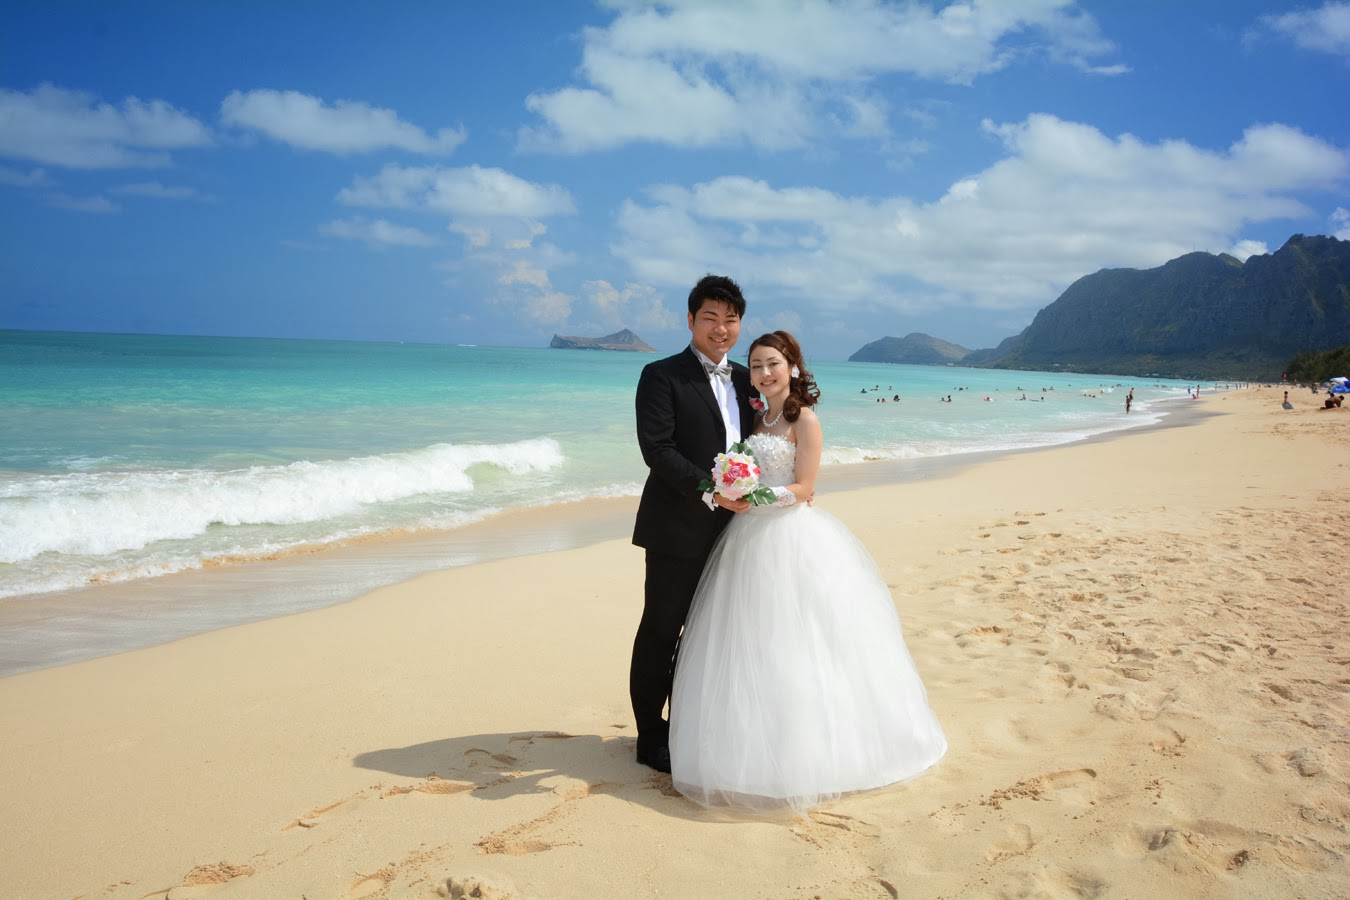 Waimanalo Beach Weddings - Bridal Dream Hawaii